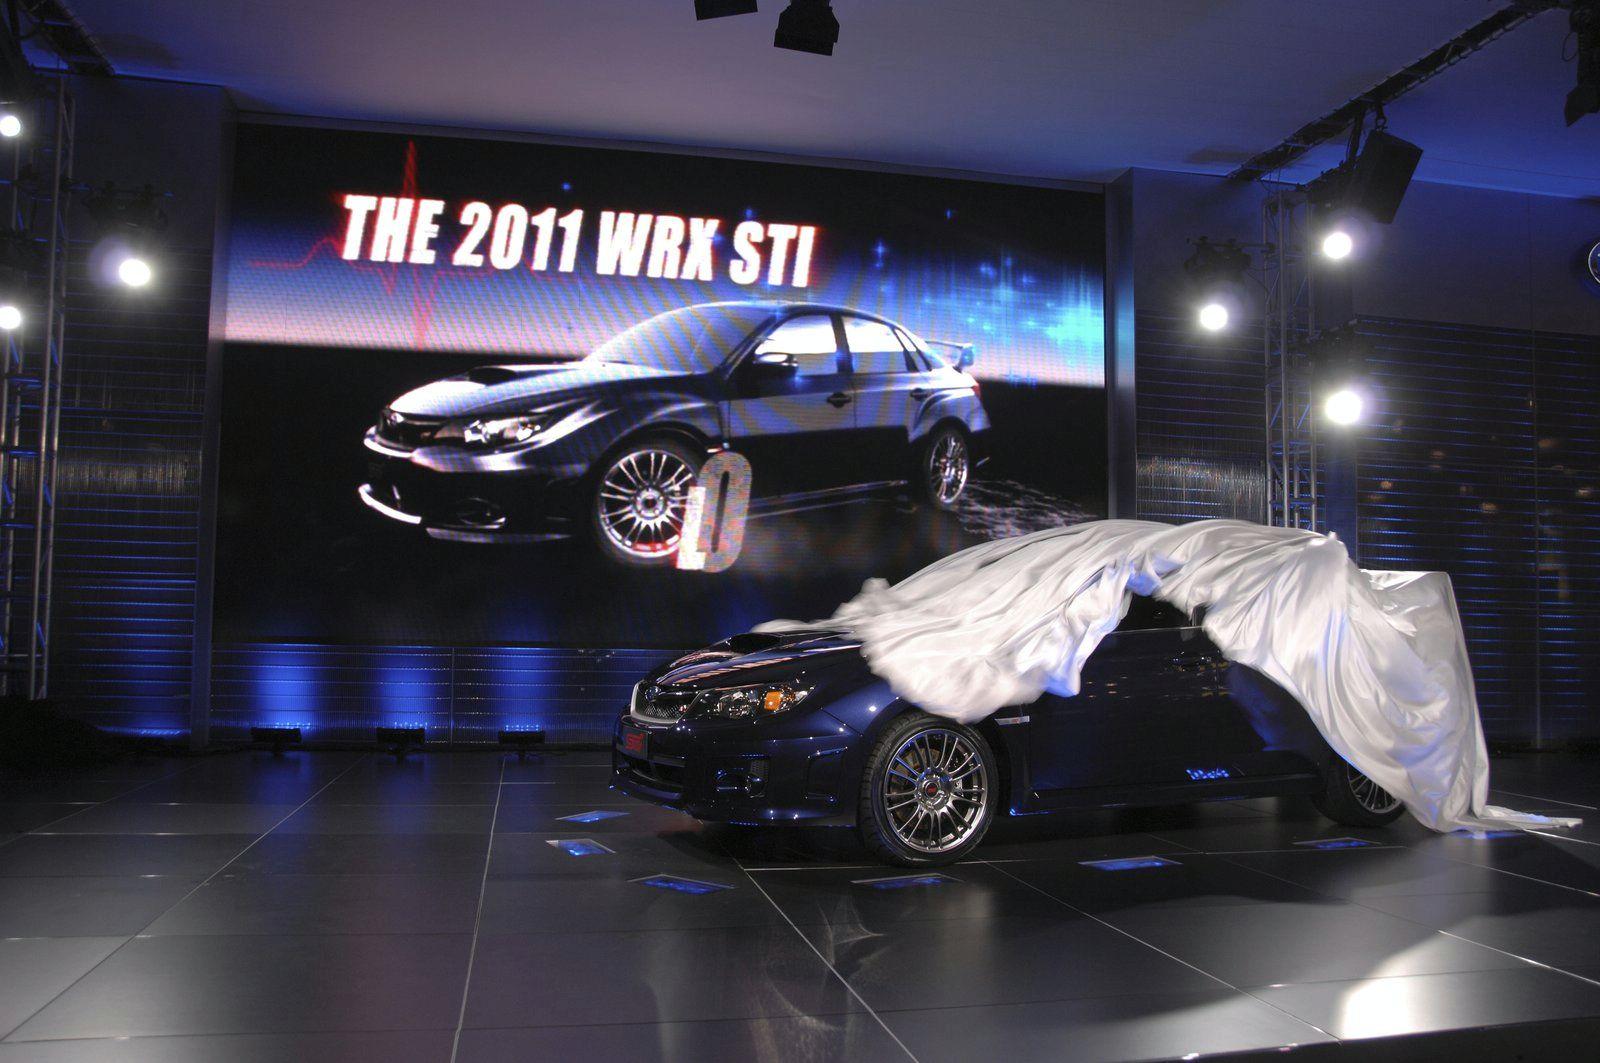 "BMW GENUINE AC SCHNITZER ALLOY WHEELS 16"" E30 3 SERIES | eBay"